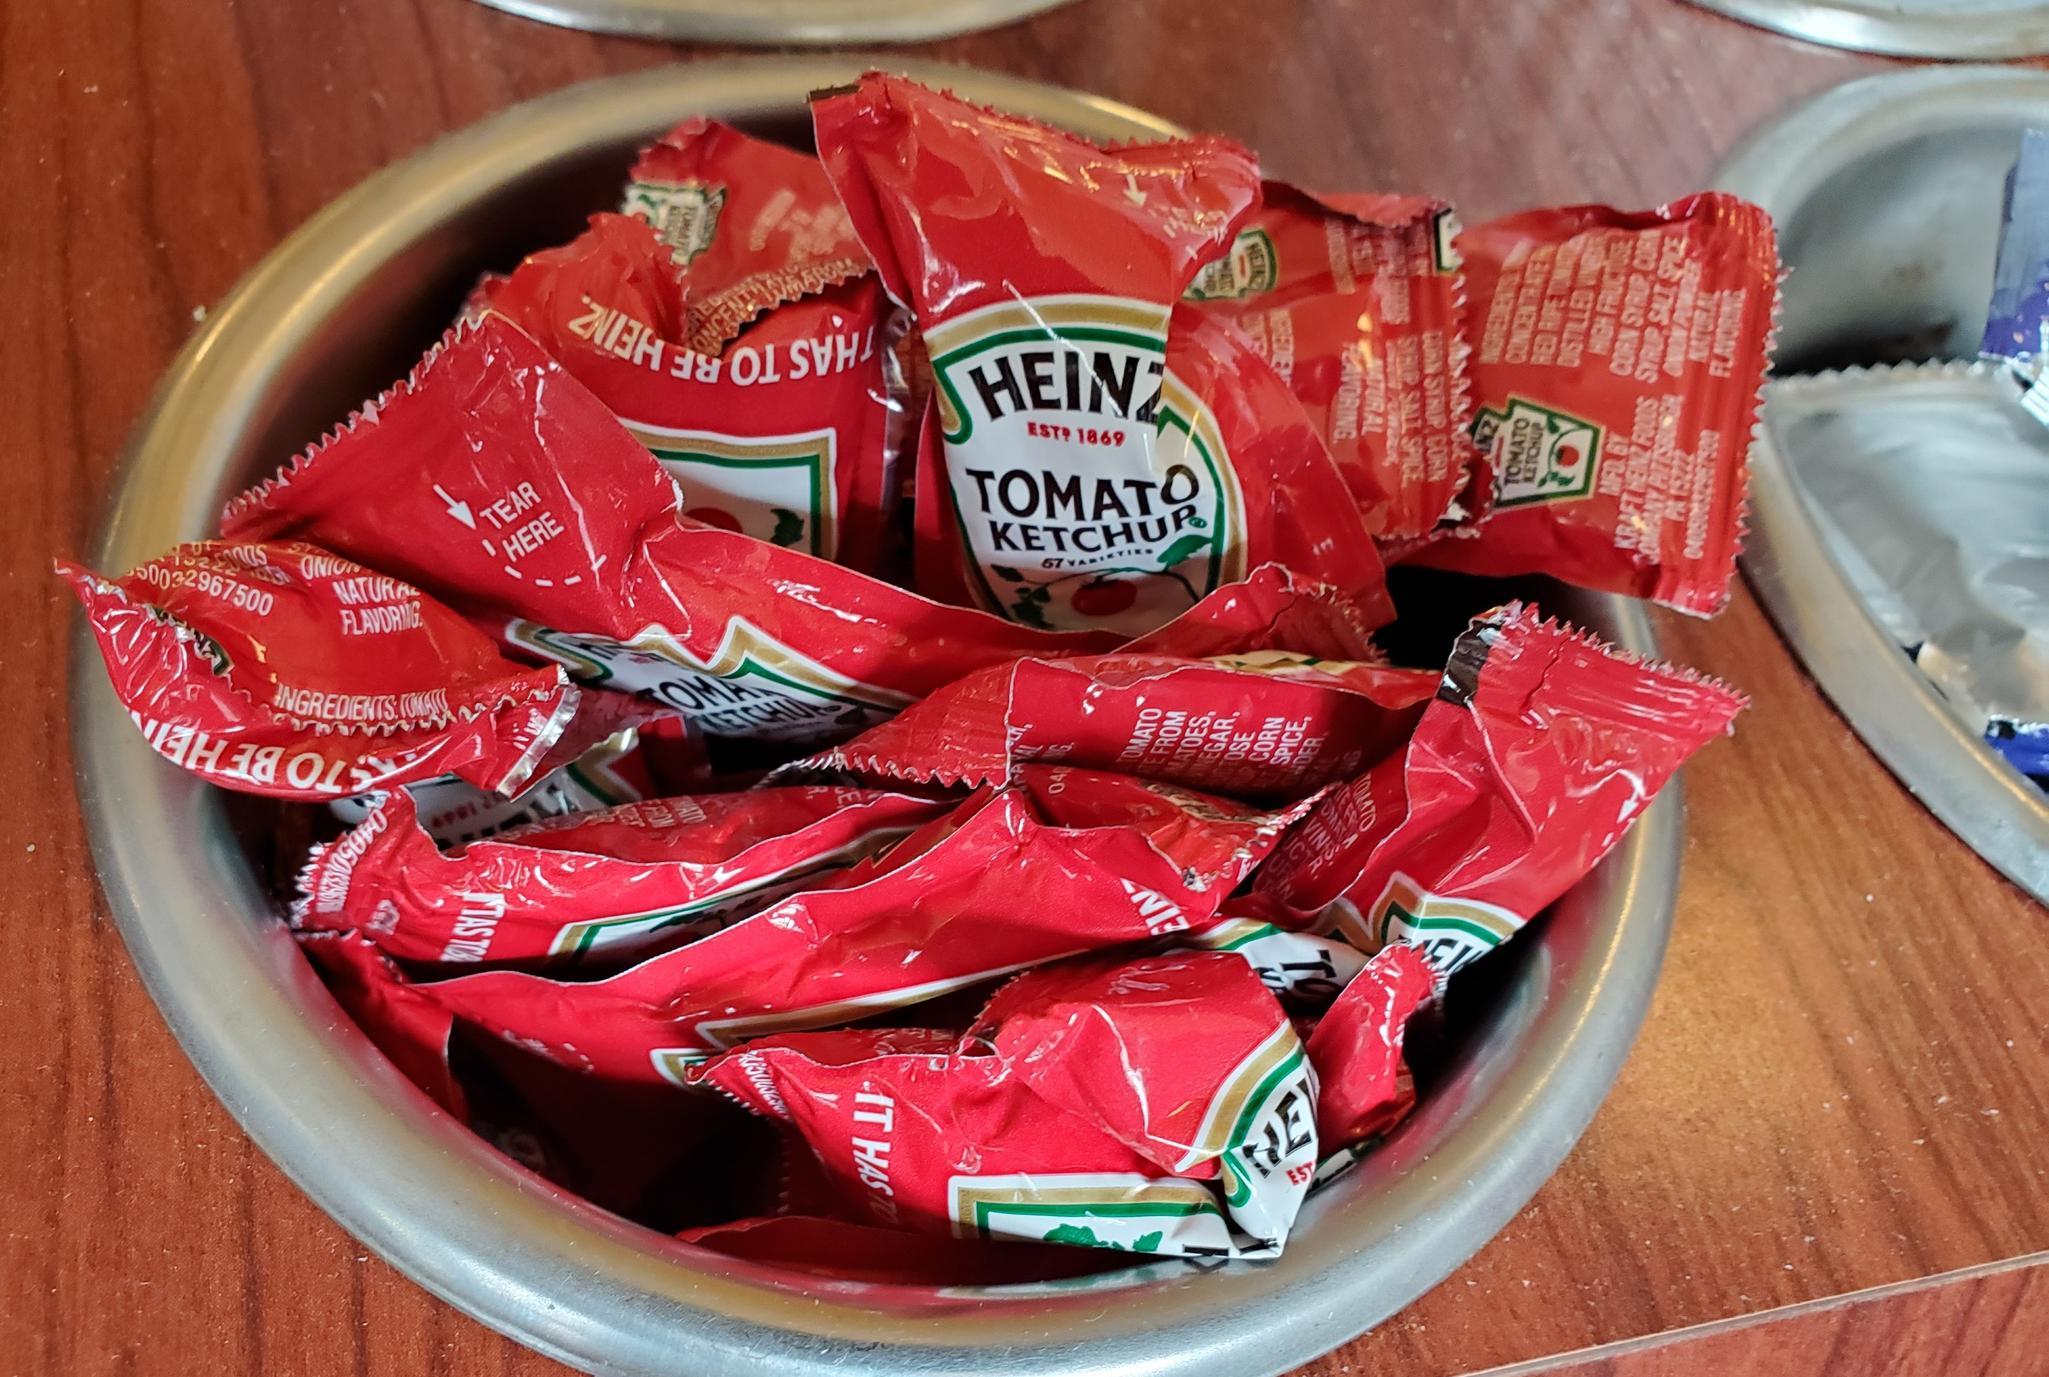 Heinz Ketchup Packets